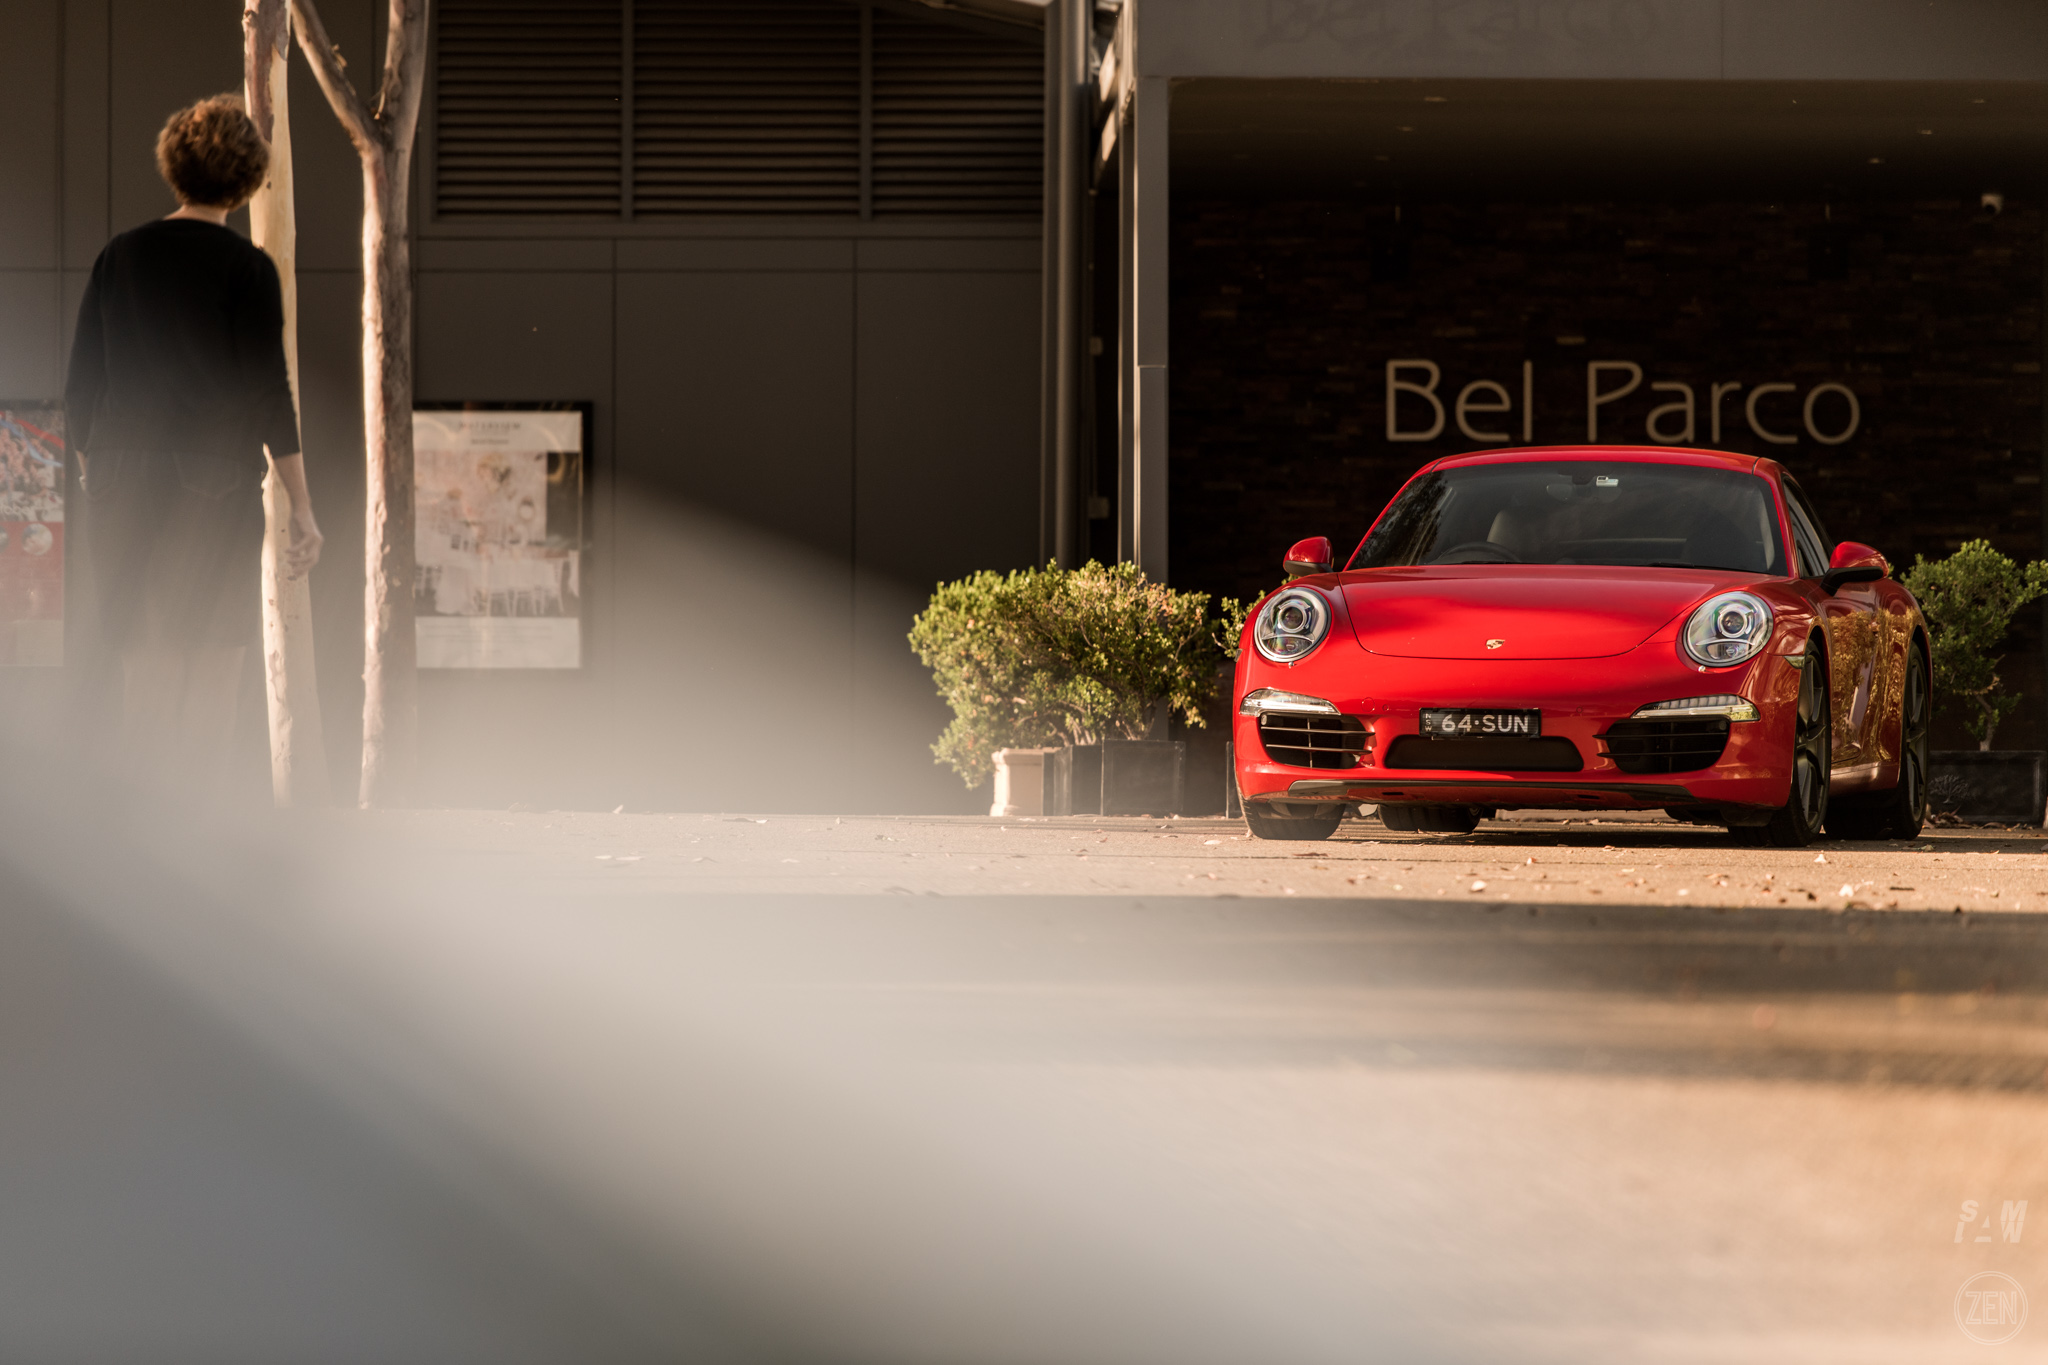 2019-10-27 - Autohaus Porsches & Coffee 121